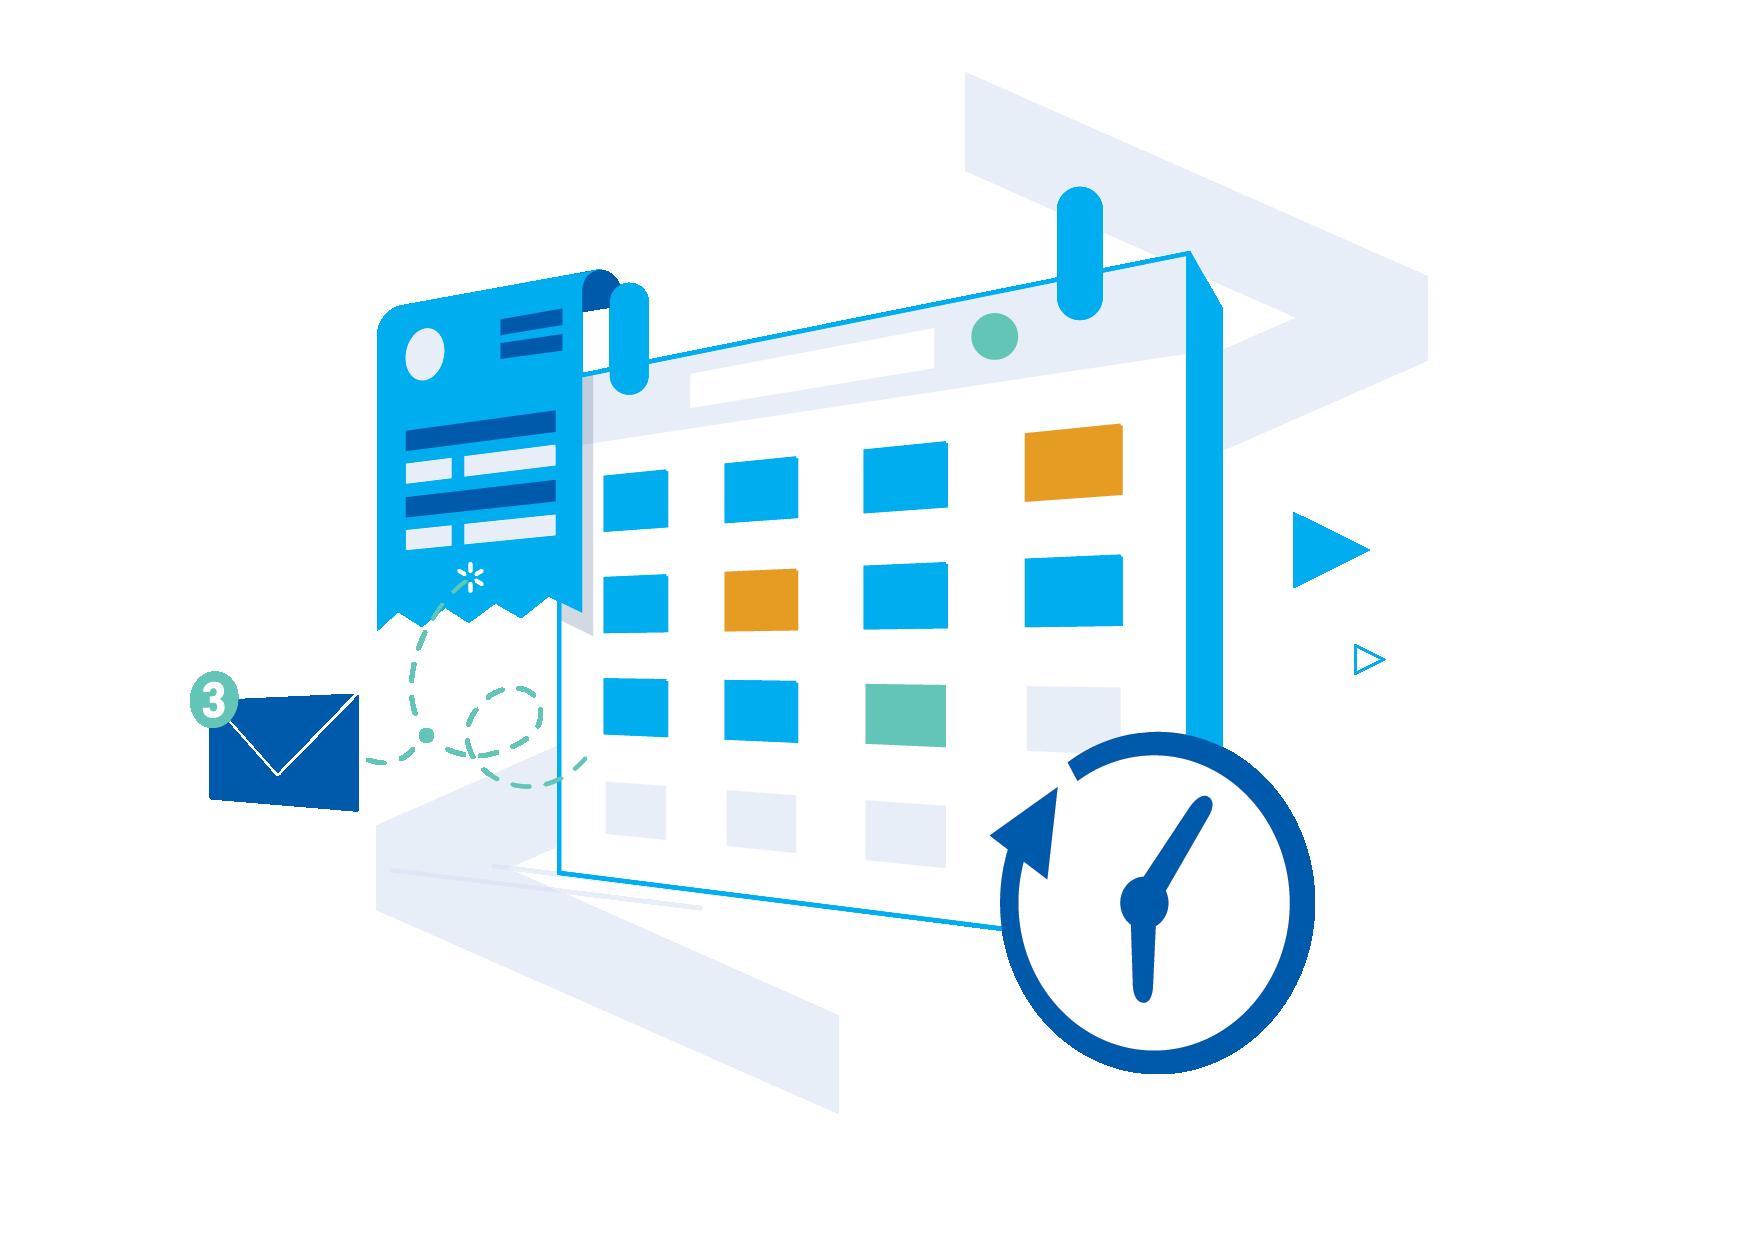 Automate schedule